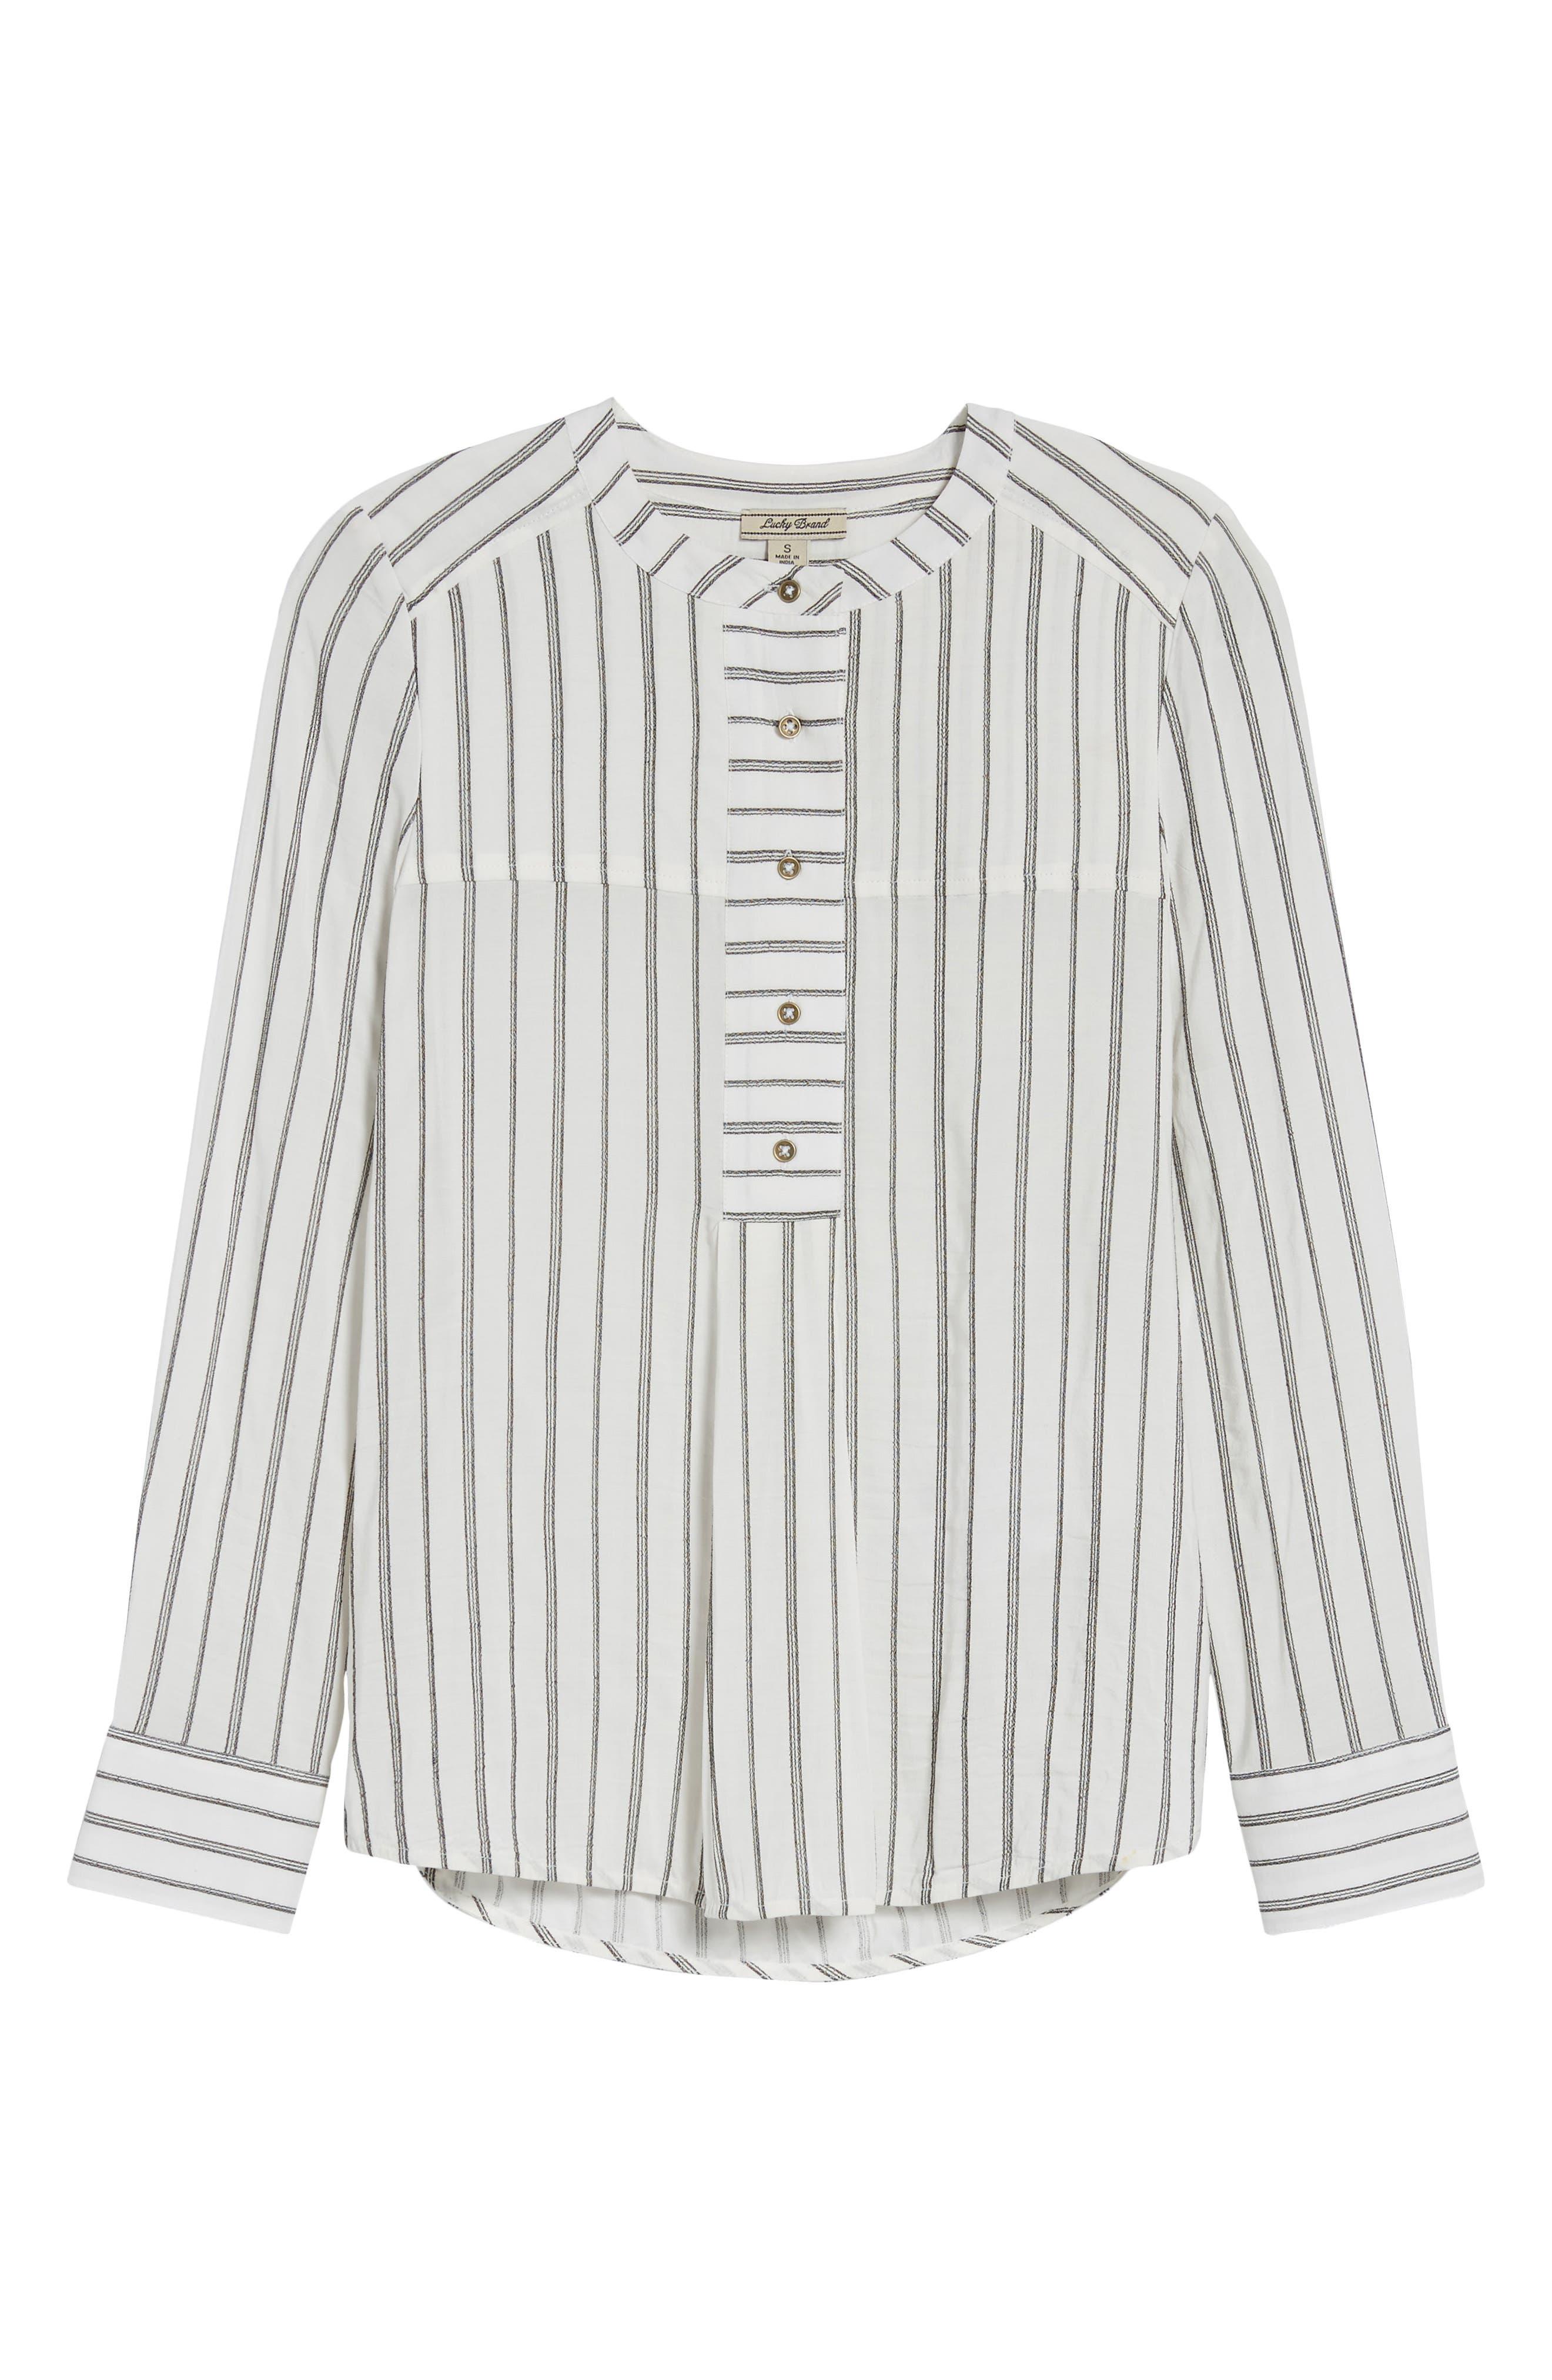 Woven Stripe Top,                             Alternate thumbnail 6, color,                             110